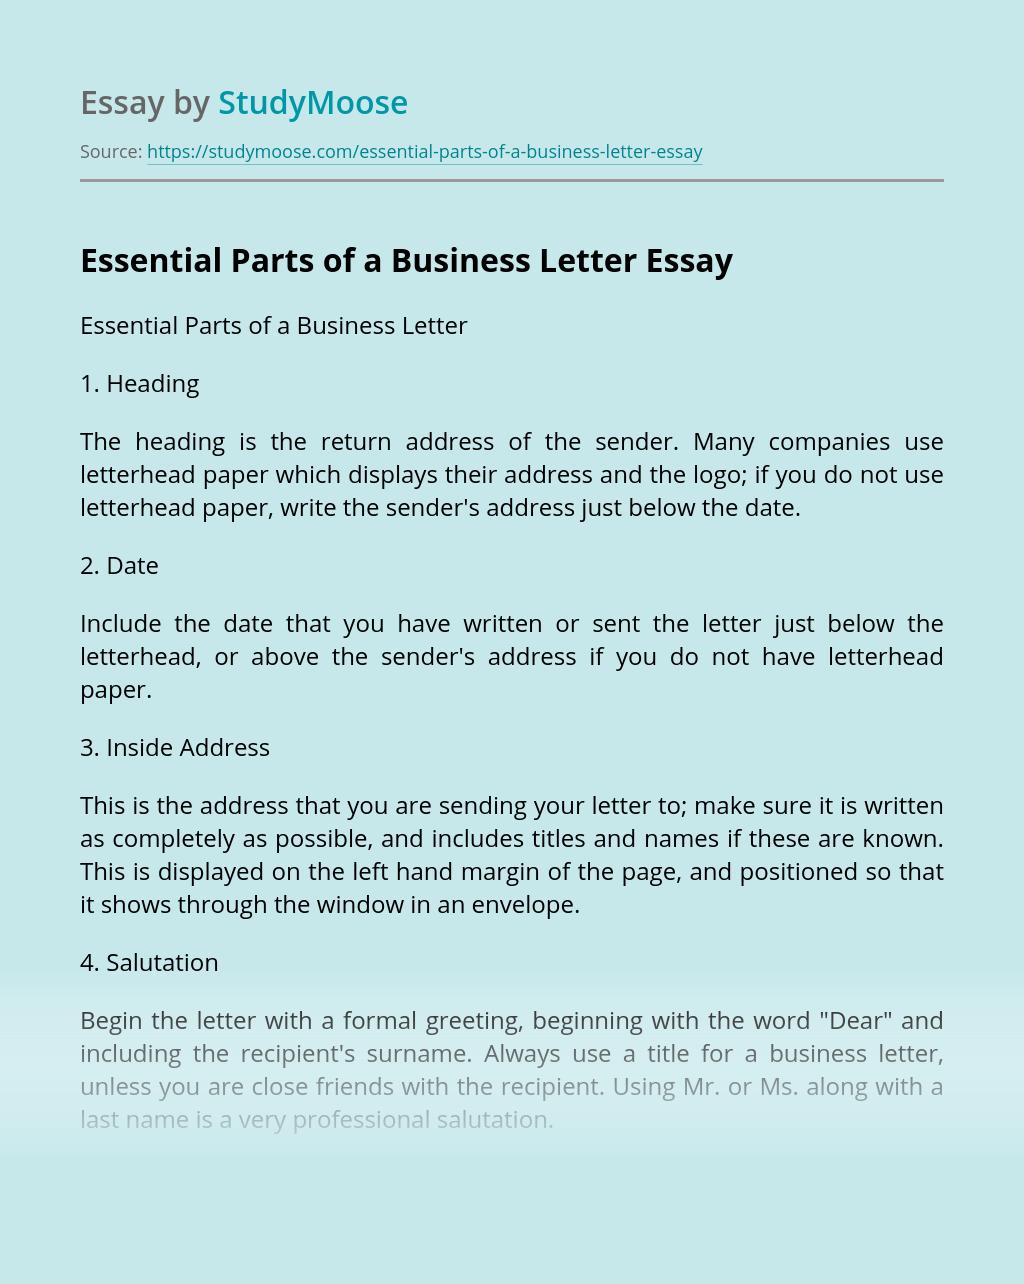 Heading For Business Letter from studymoose.com